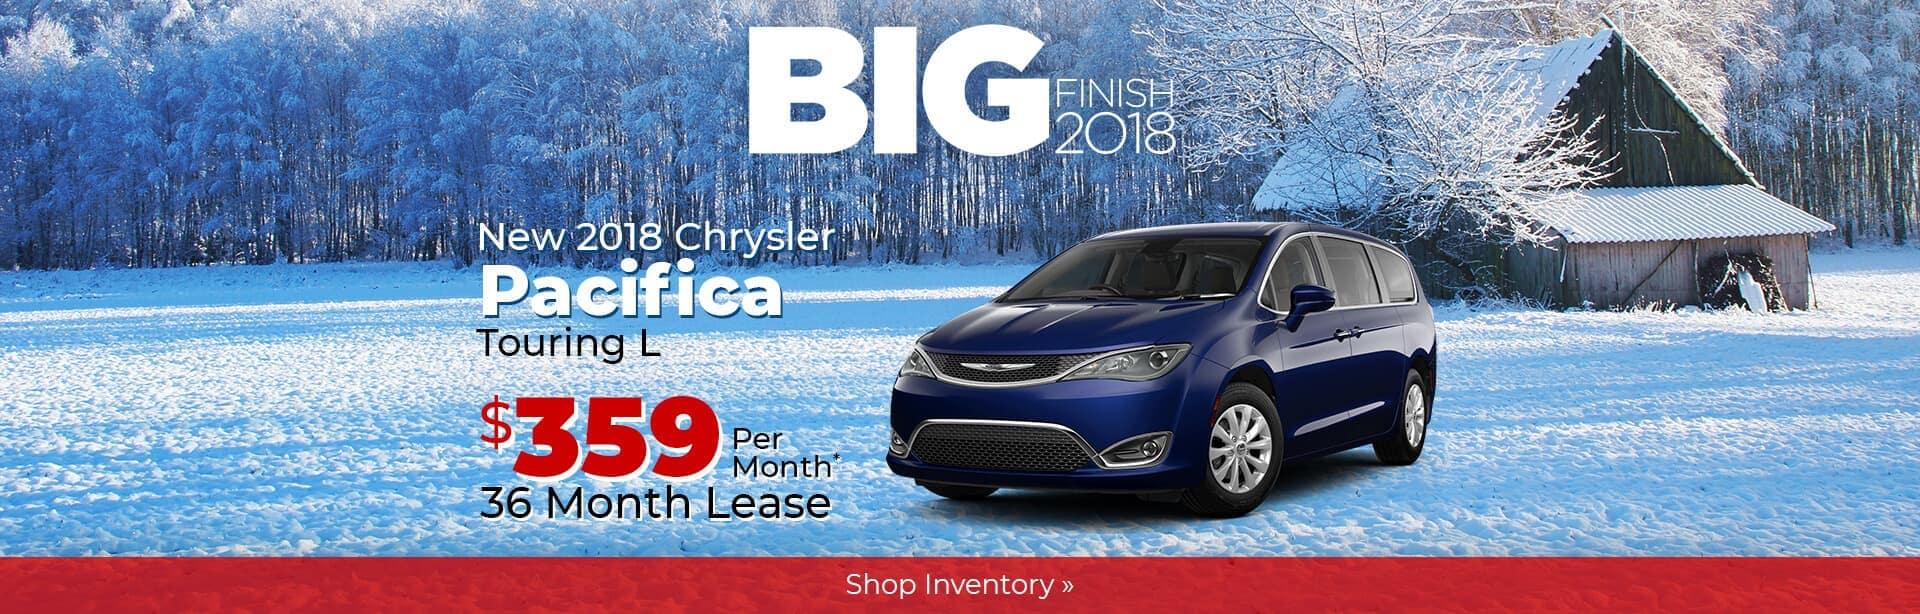 2018 Chrysler Pacifica Big Finish Savings near Lafayette, Indiana.